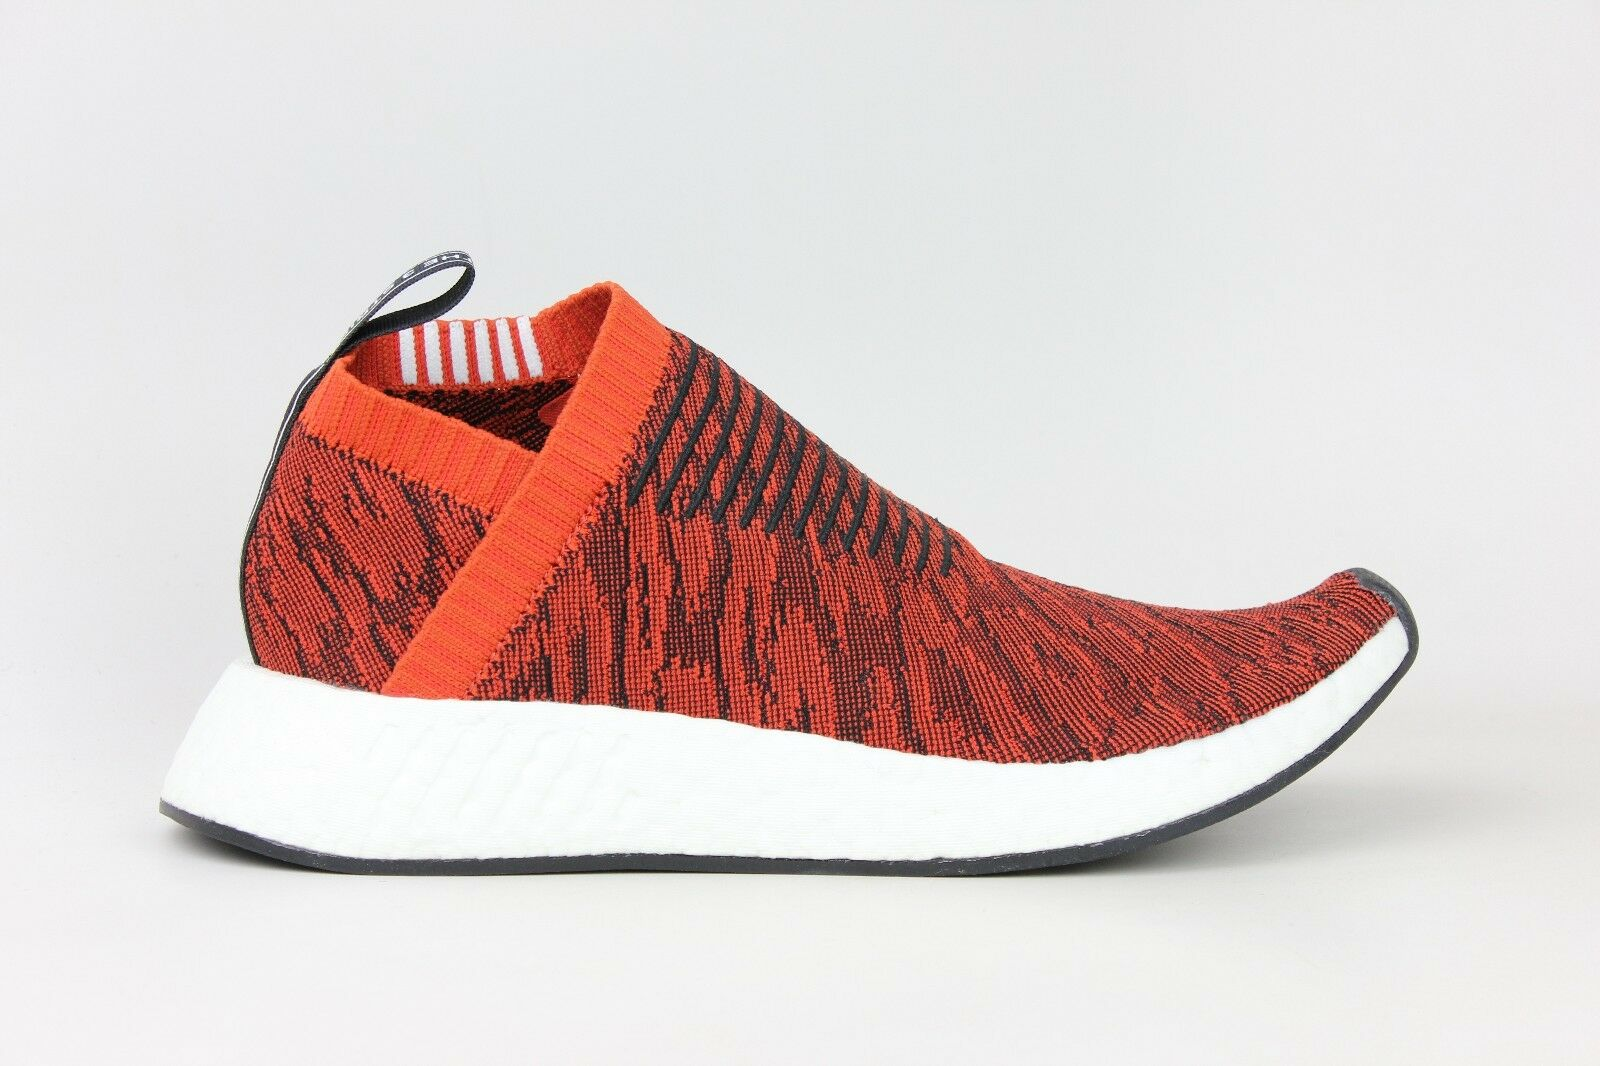 Adidas Originals NMD_CS2 PK Primeknit Boost Red Black White Mens BY9406 1801-39